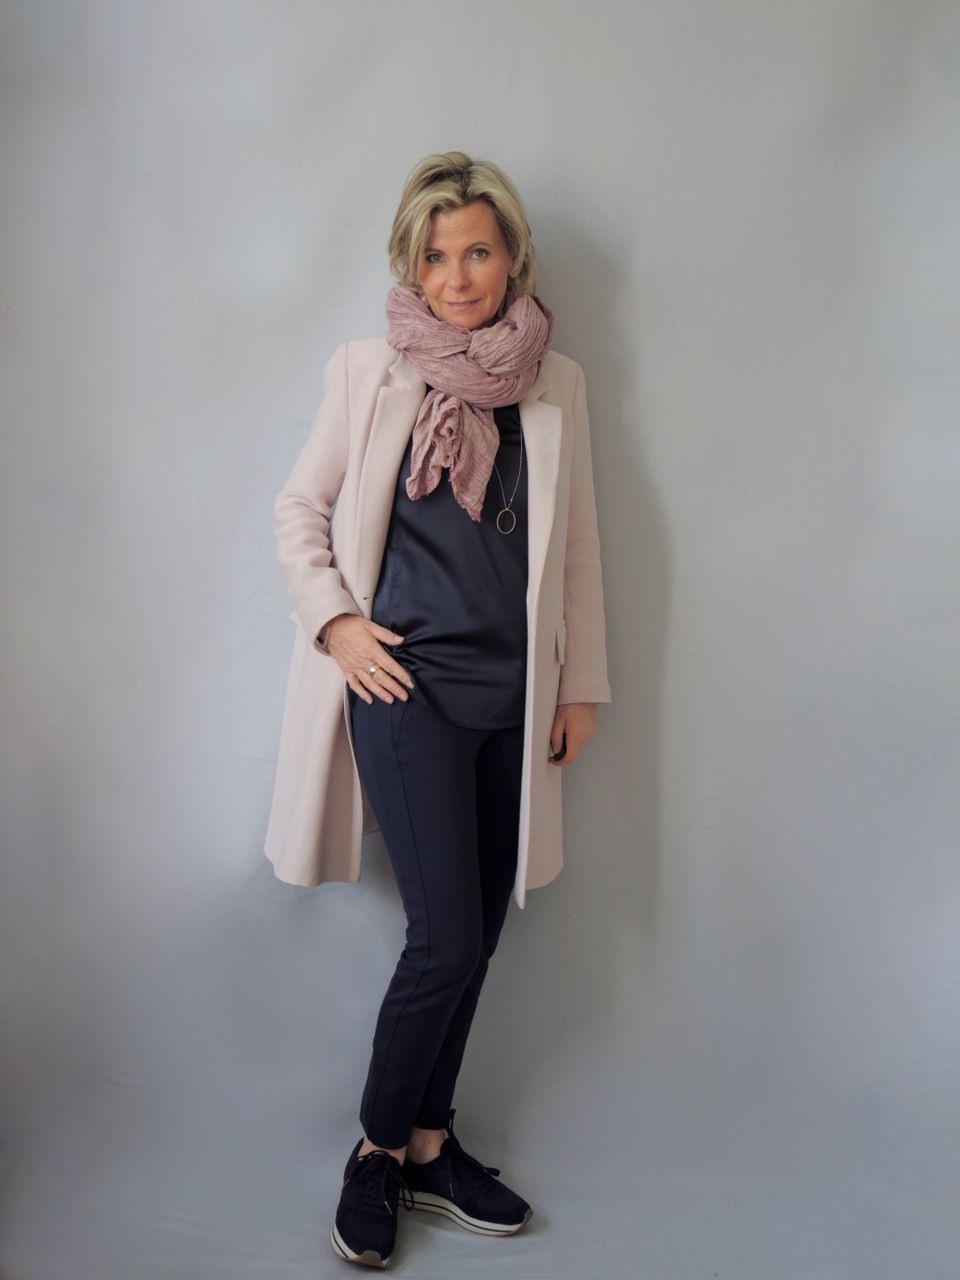 Kreativ Kleider Ab 50 Stylish20 Einzigartig Kleider Ab 50 Galerie